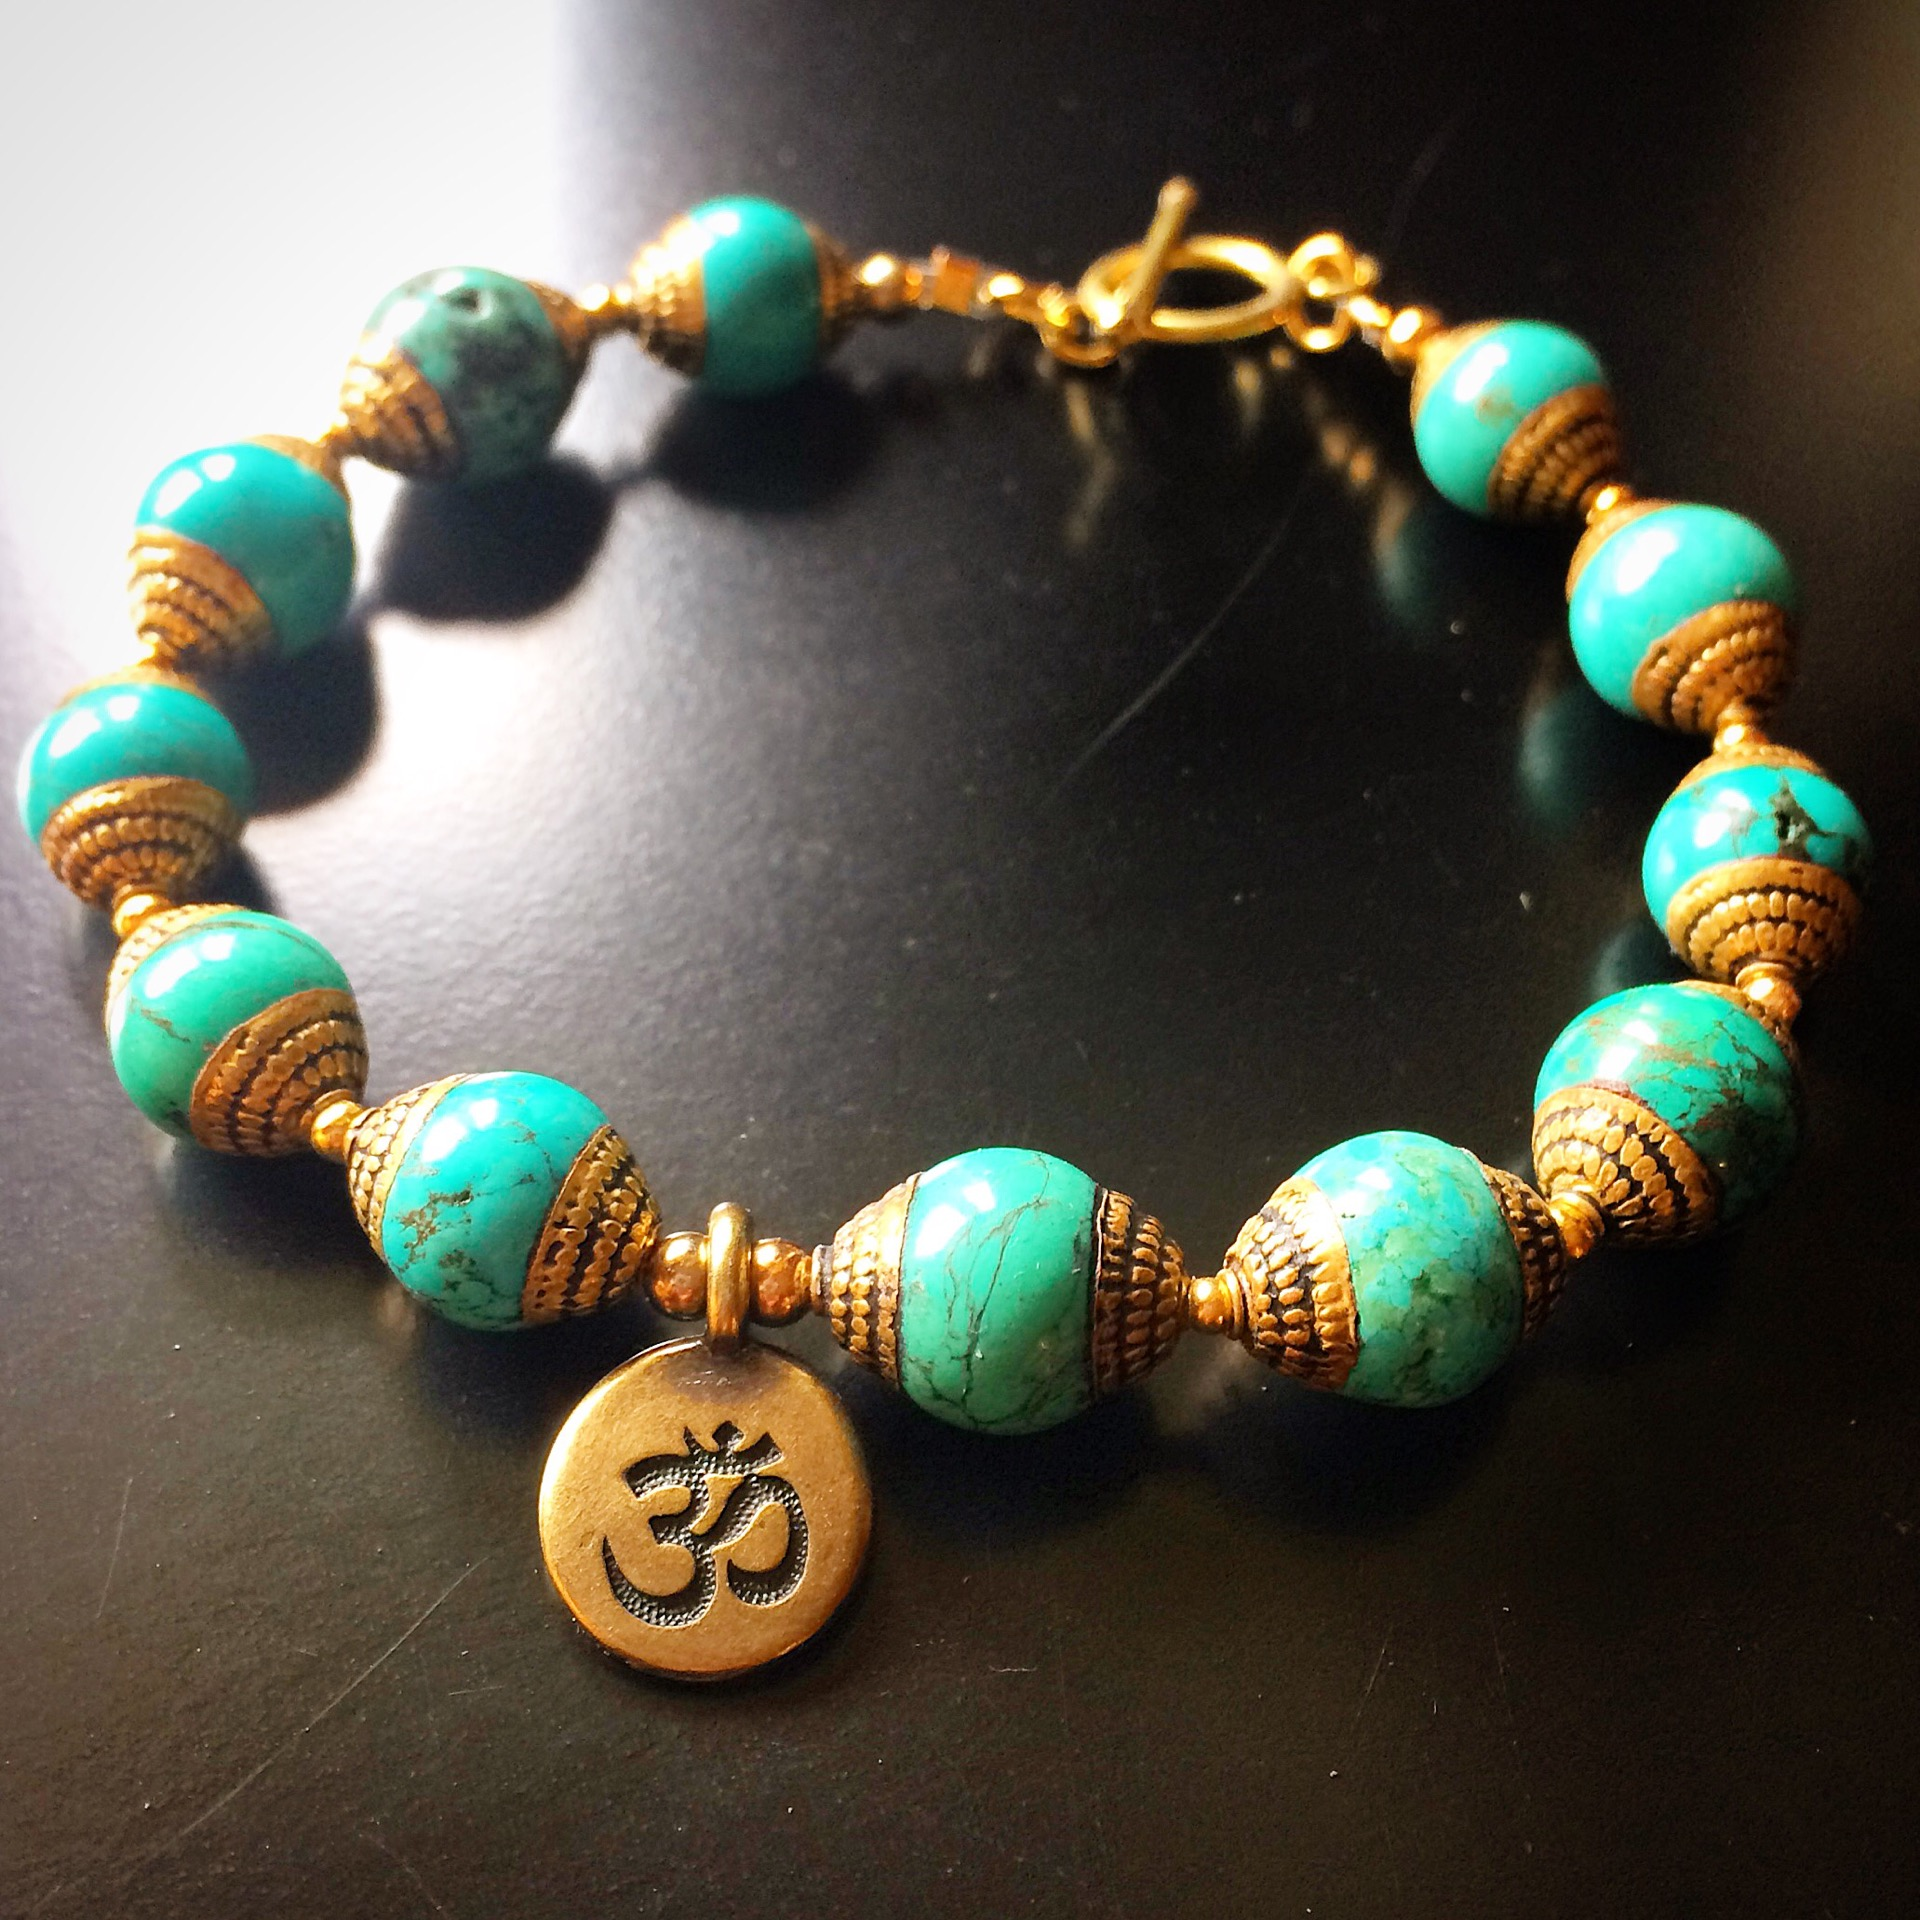 ROX Turquoise Tibetan Bead Bracelet with Zen Charm and ...